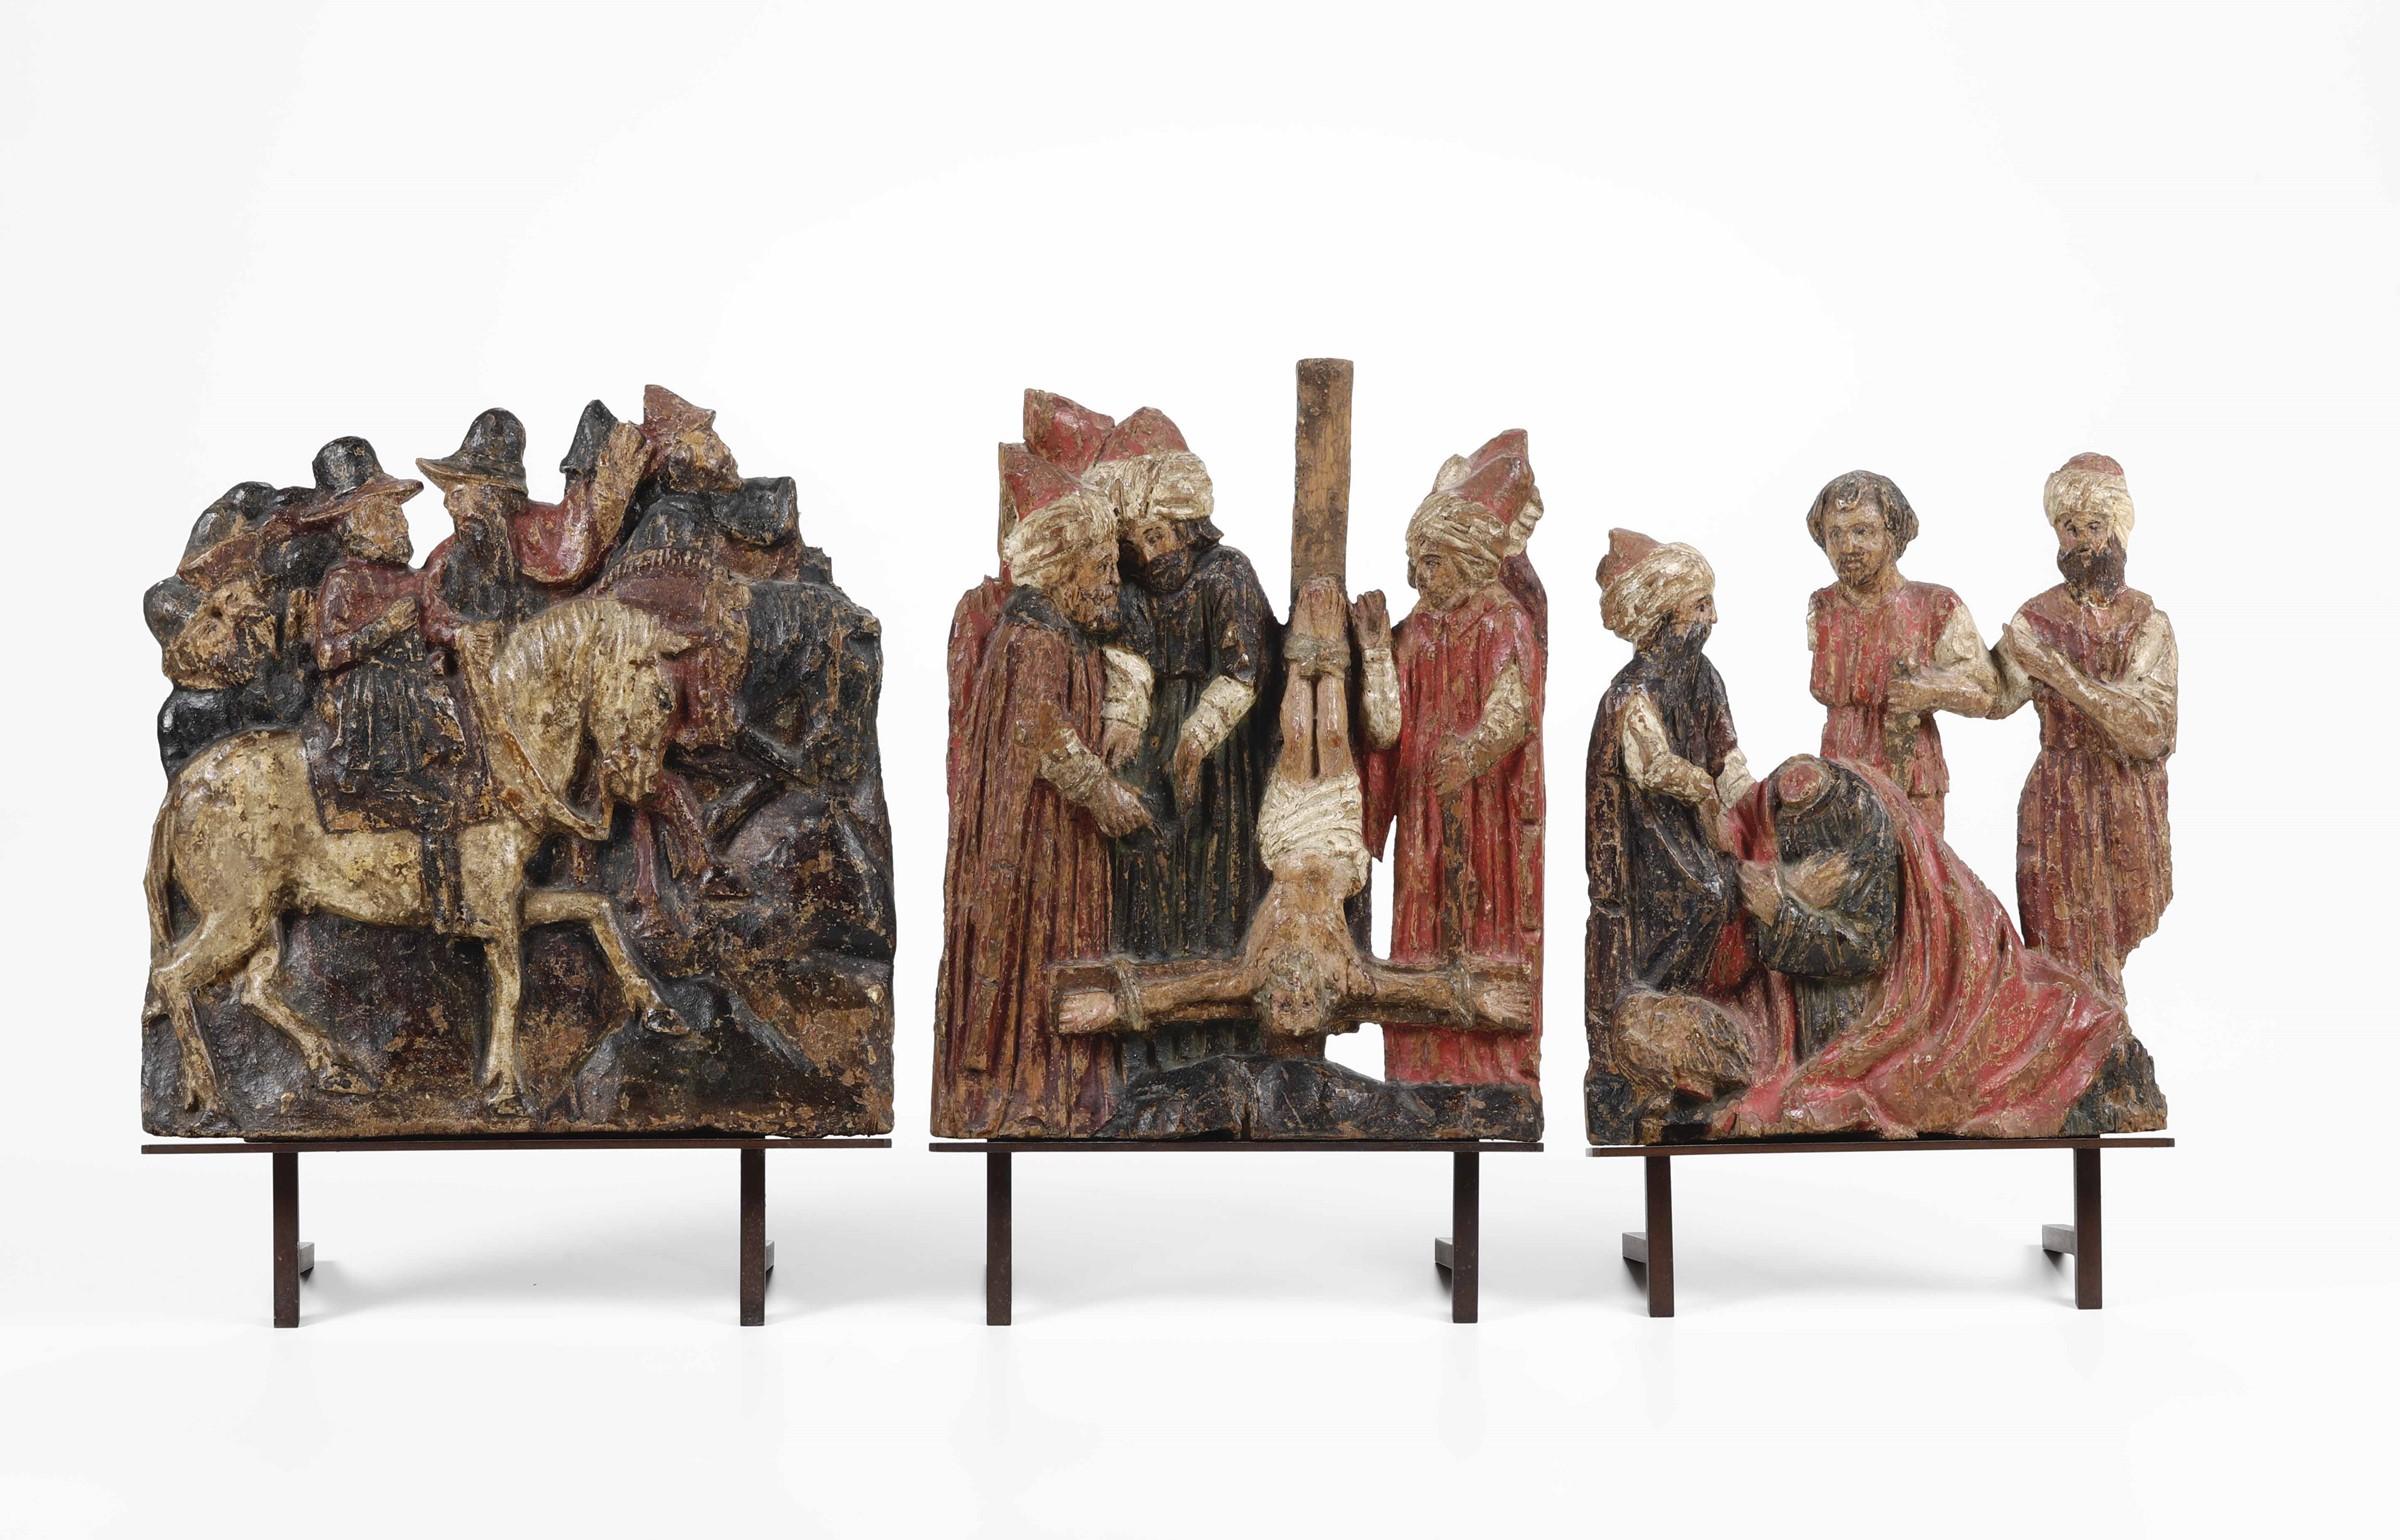 Lot 102 - Magi a cavallo, martirio di San Pietro e San Paolo. Rilievi in legno policromo Arte [...]